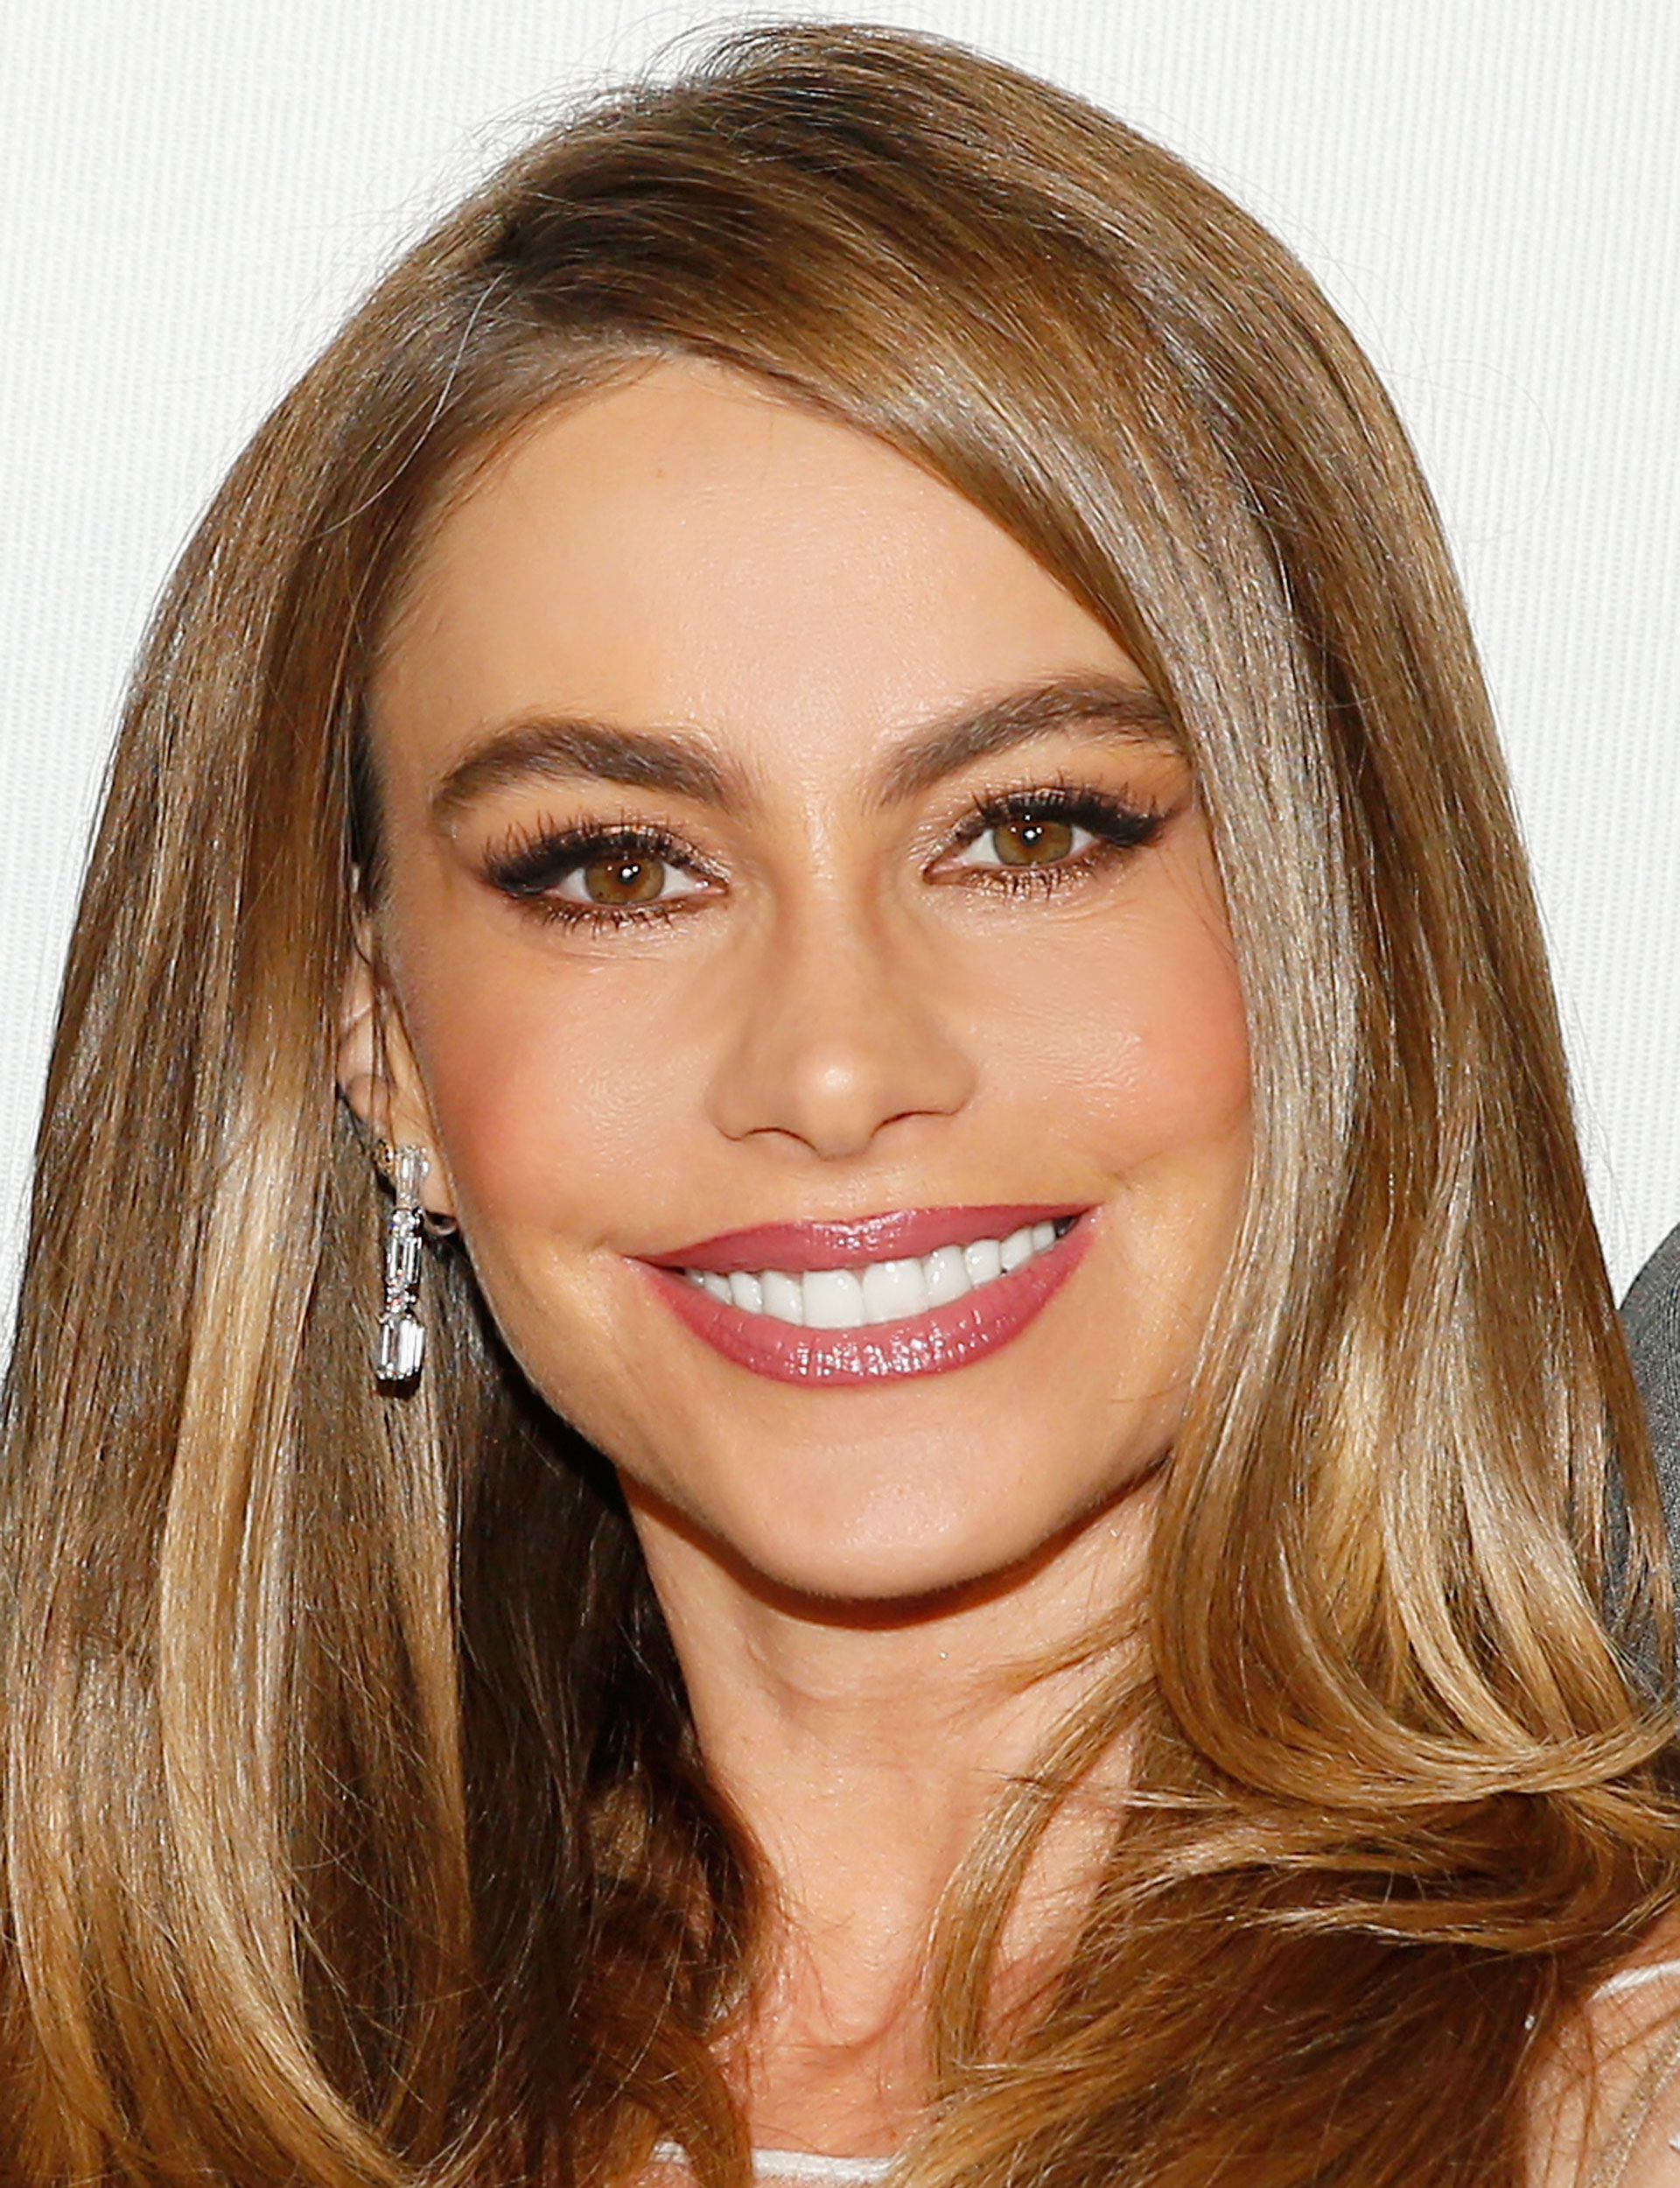 Celebrity Eyebrows - Eyebrow Shape Inspiration